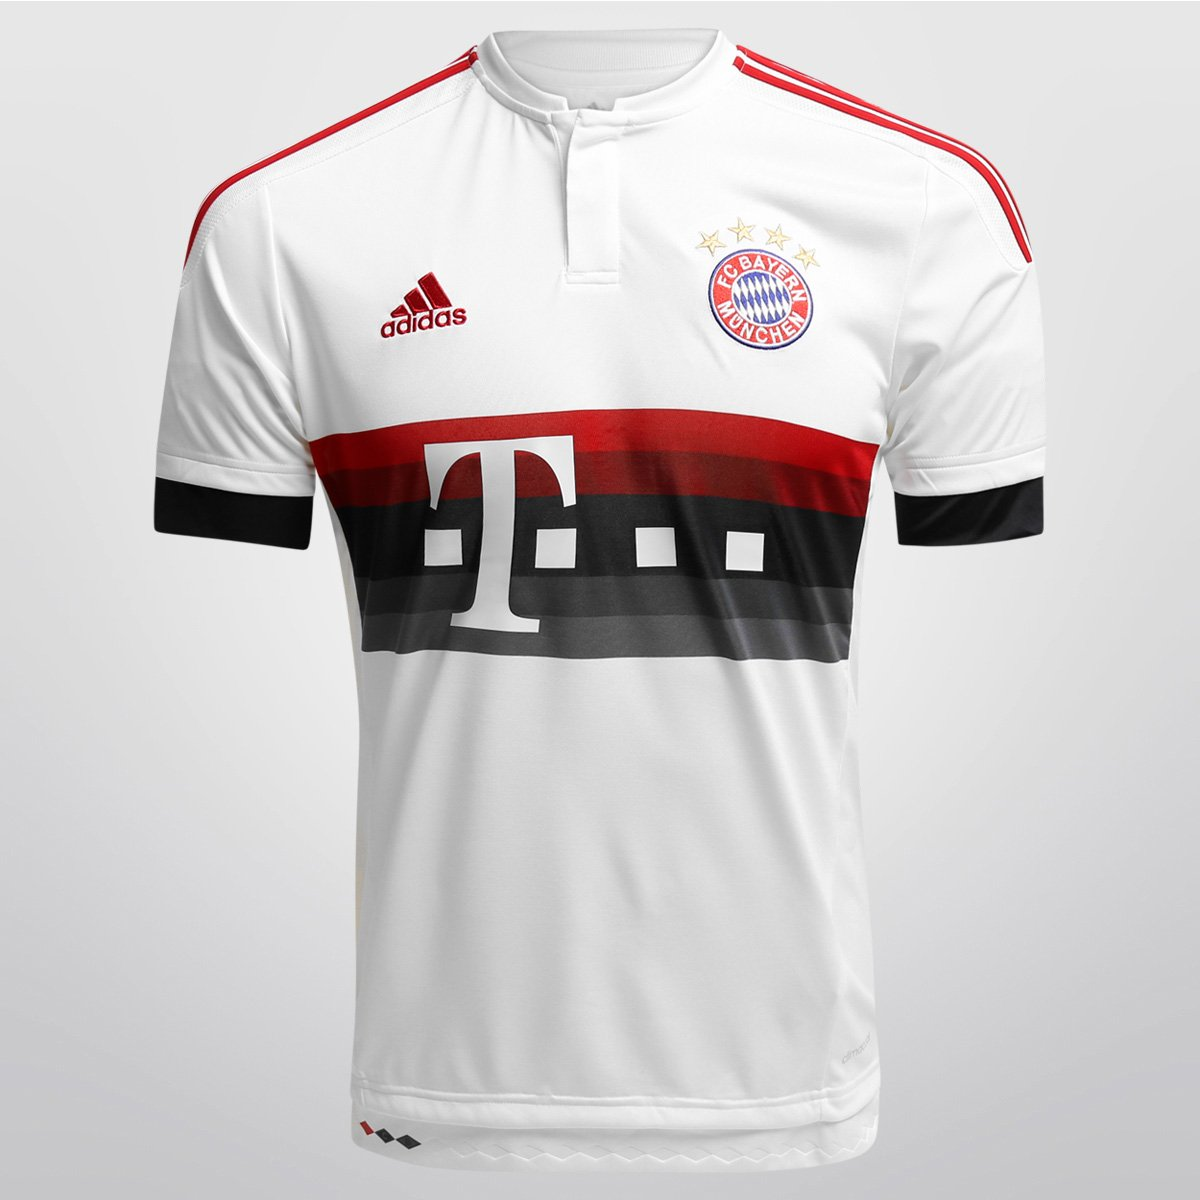 7f39fbb5677b6 Camisa Bayern de Munique Away 15 16 s nº Torcedor Adidas Masculina - Compre  Agora